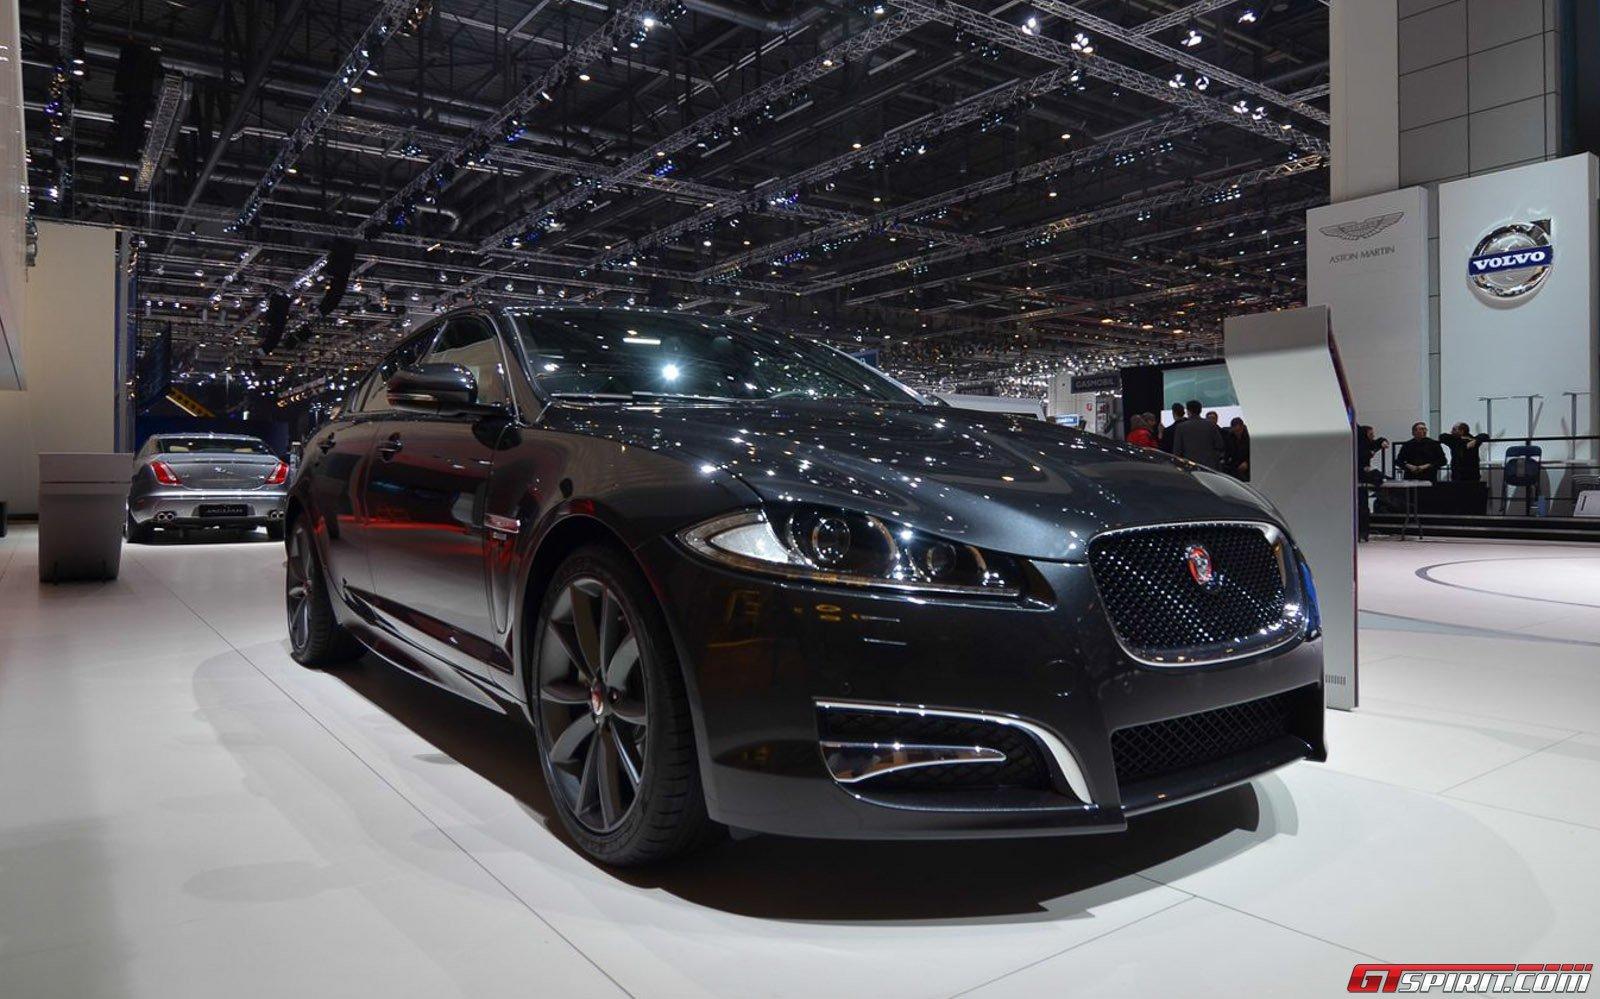 Jaguar XF R Sport At The Geneva Motor Show 2014